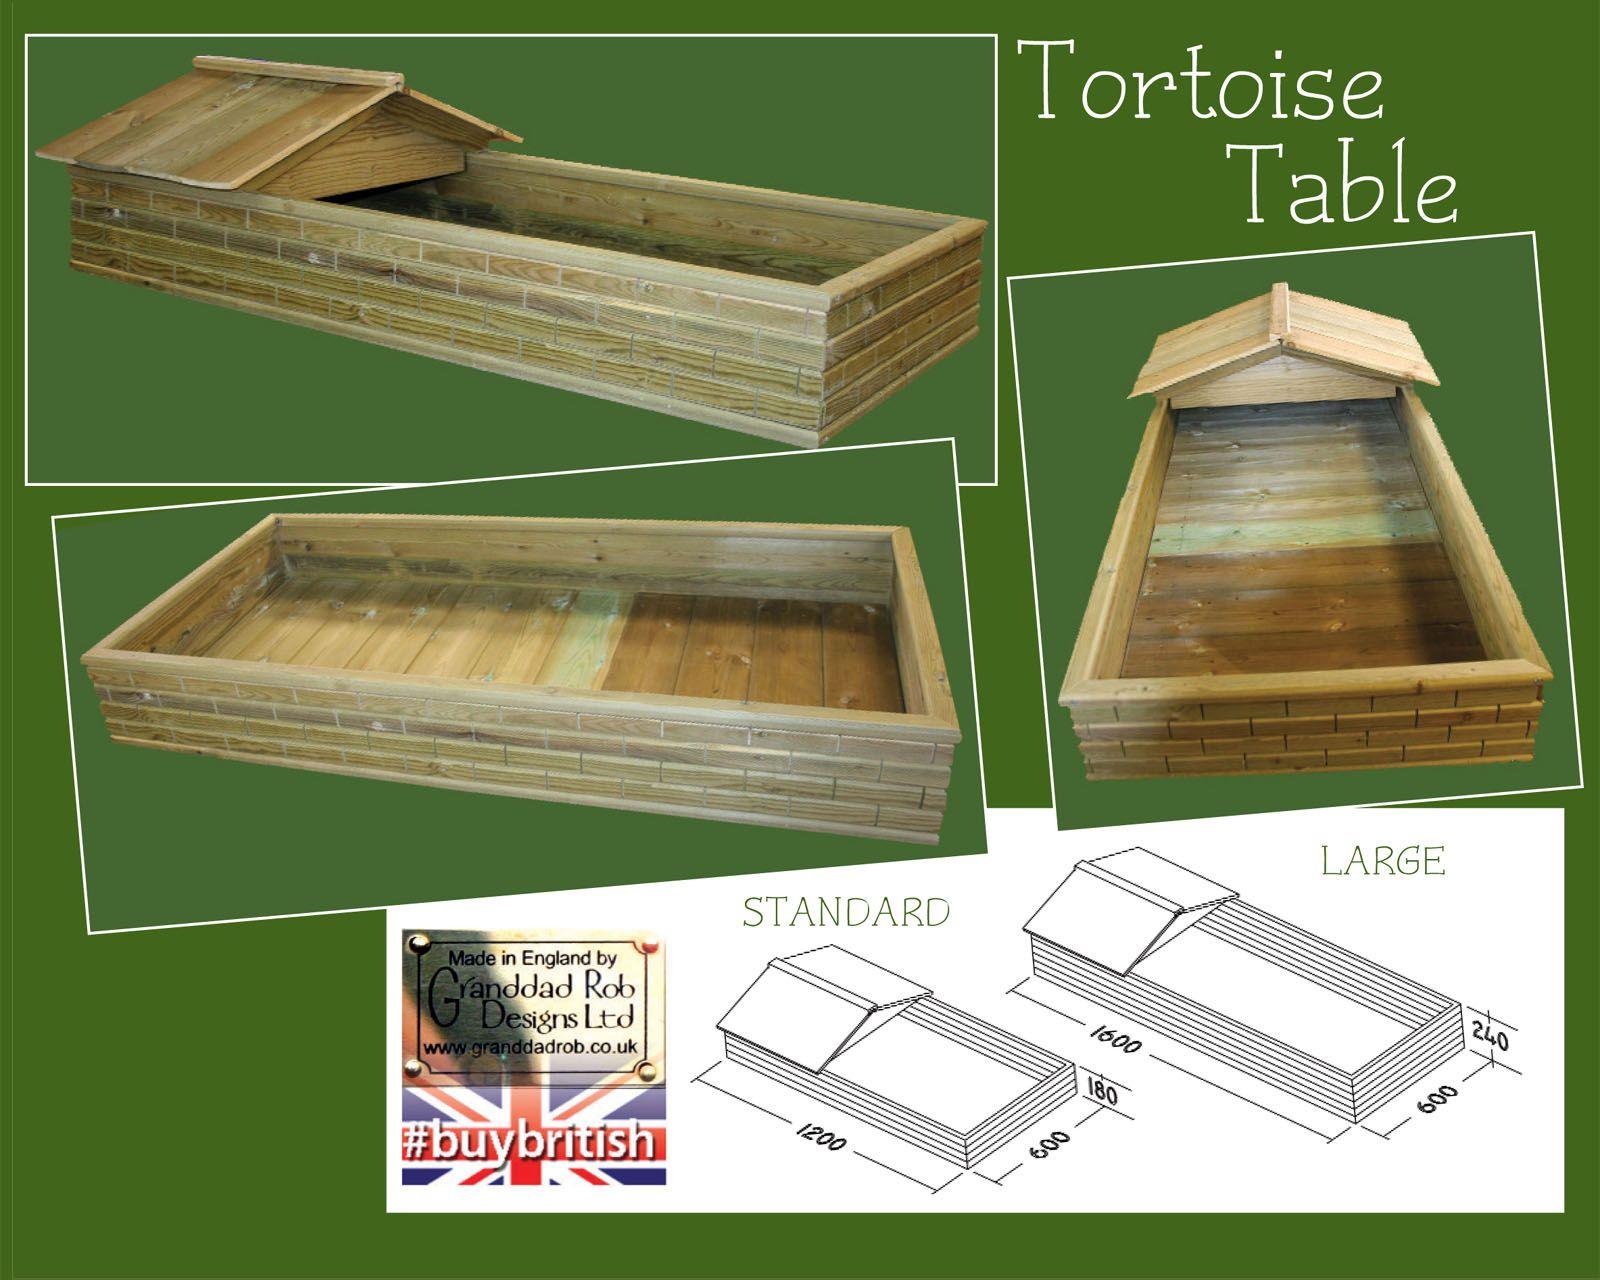 Tortoise table species specific products vivexotic vivariums - Small Tortoise Table